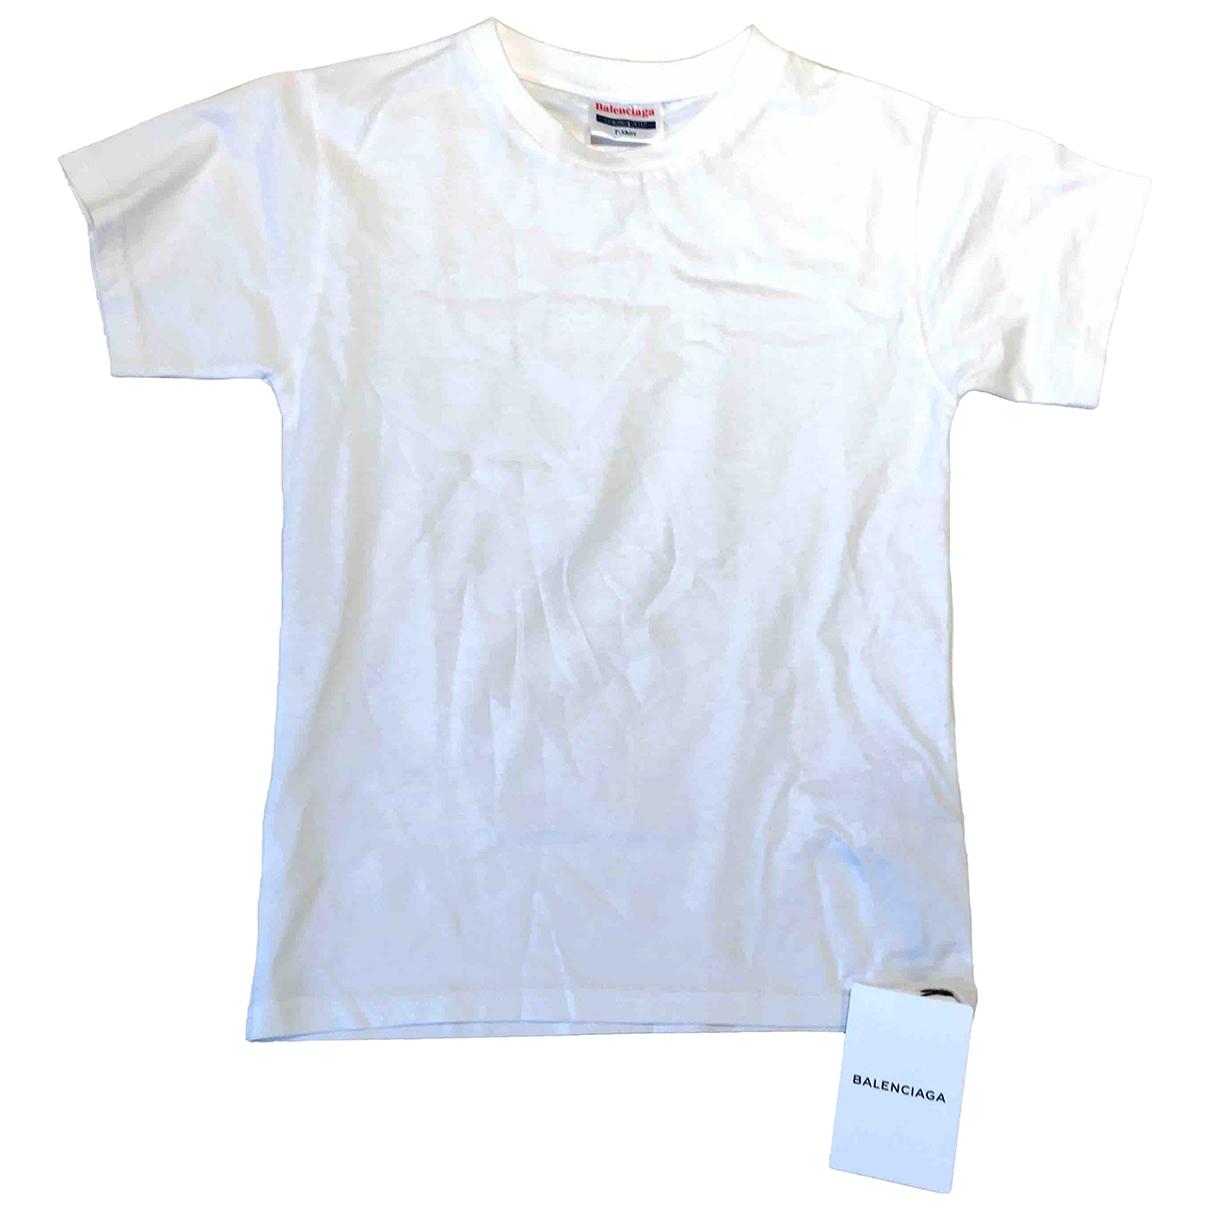 Balenciaga \N White Cotton  top for Kids 14 years - S FR